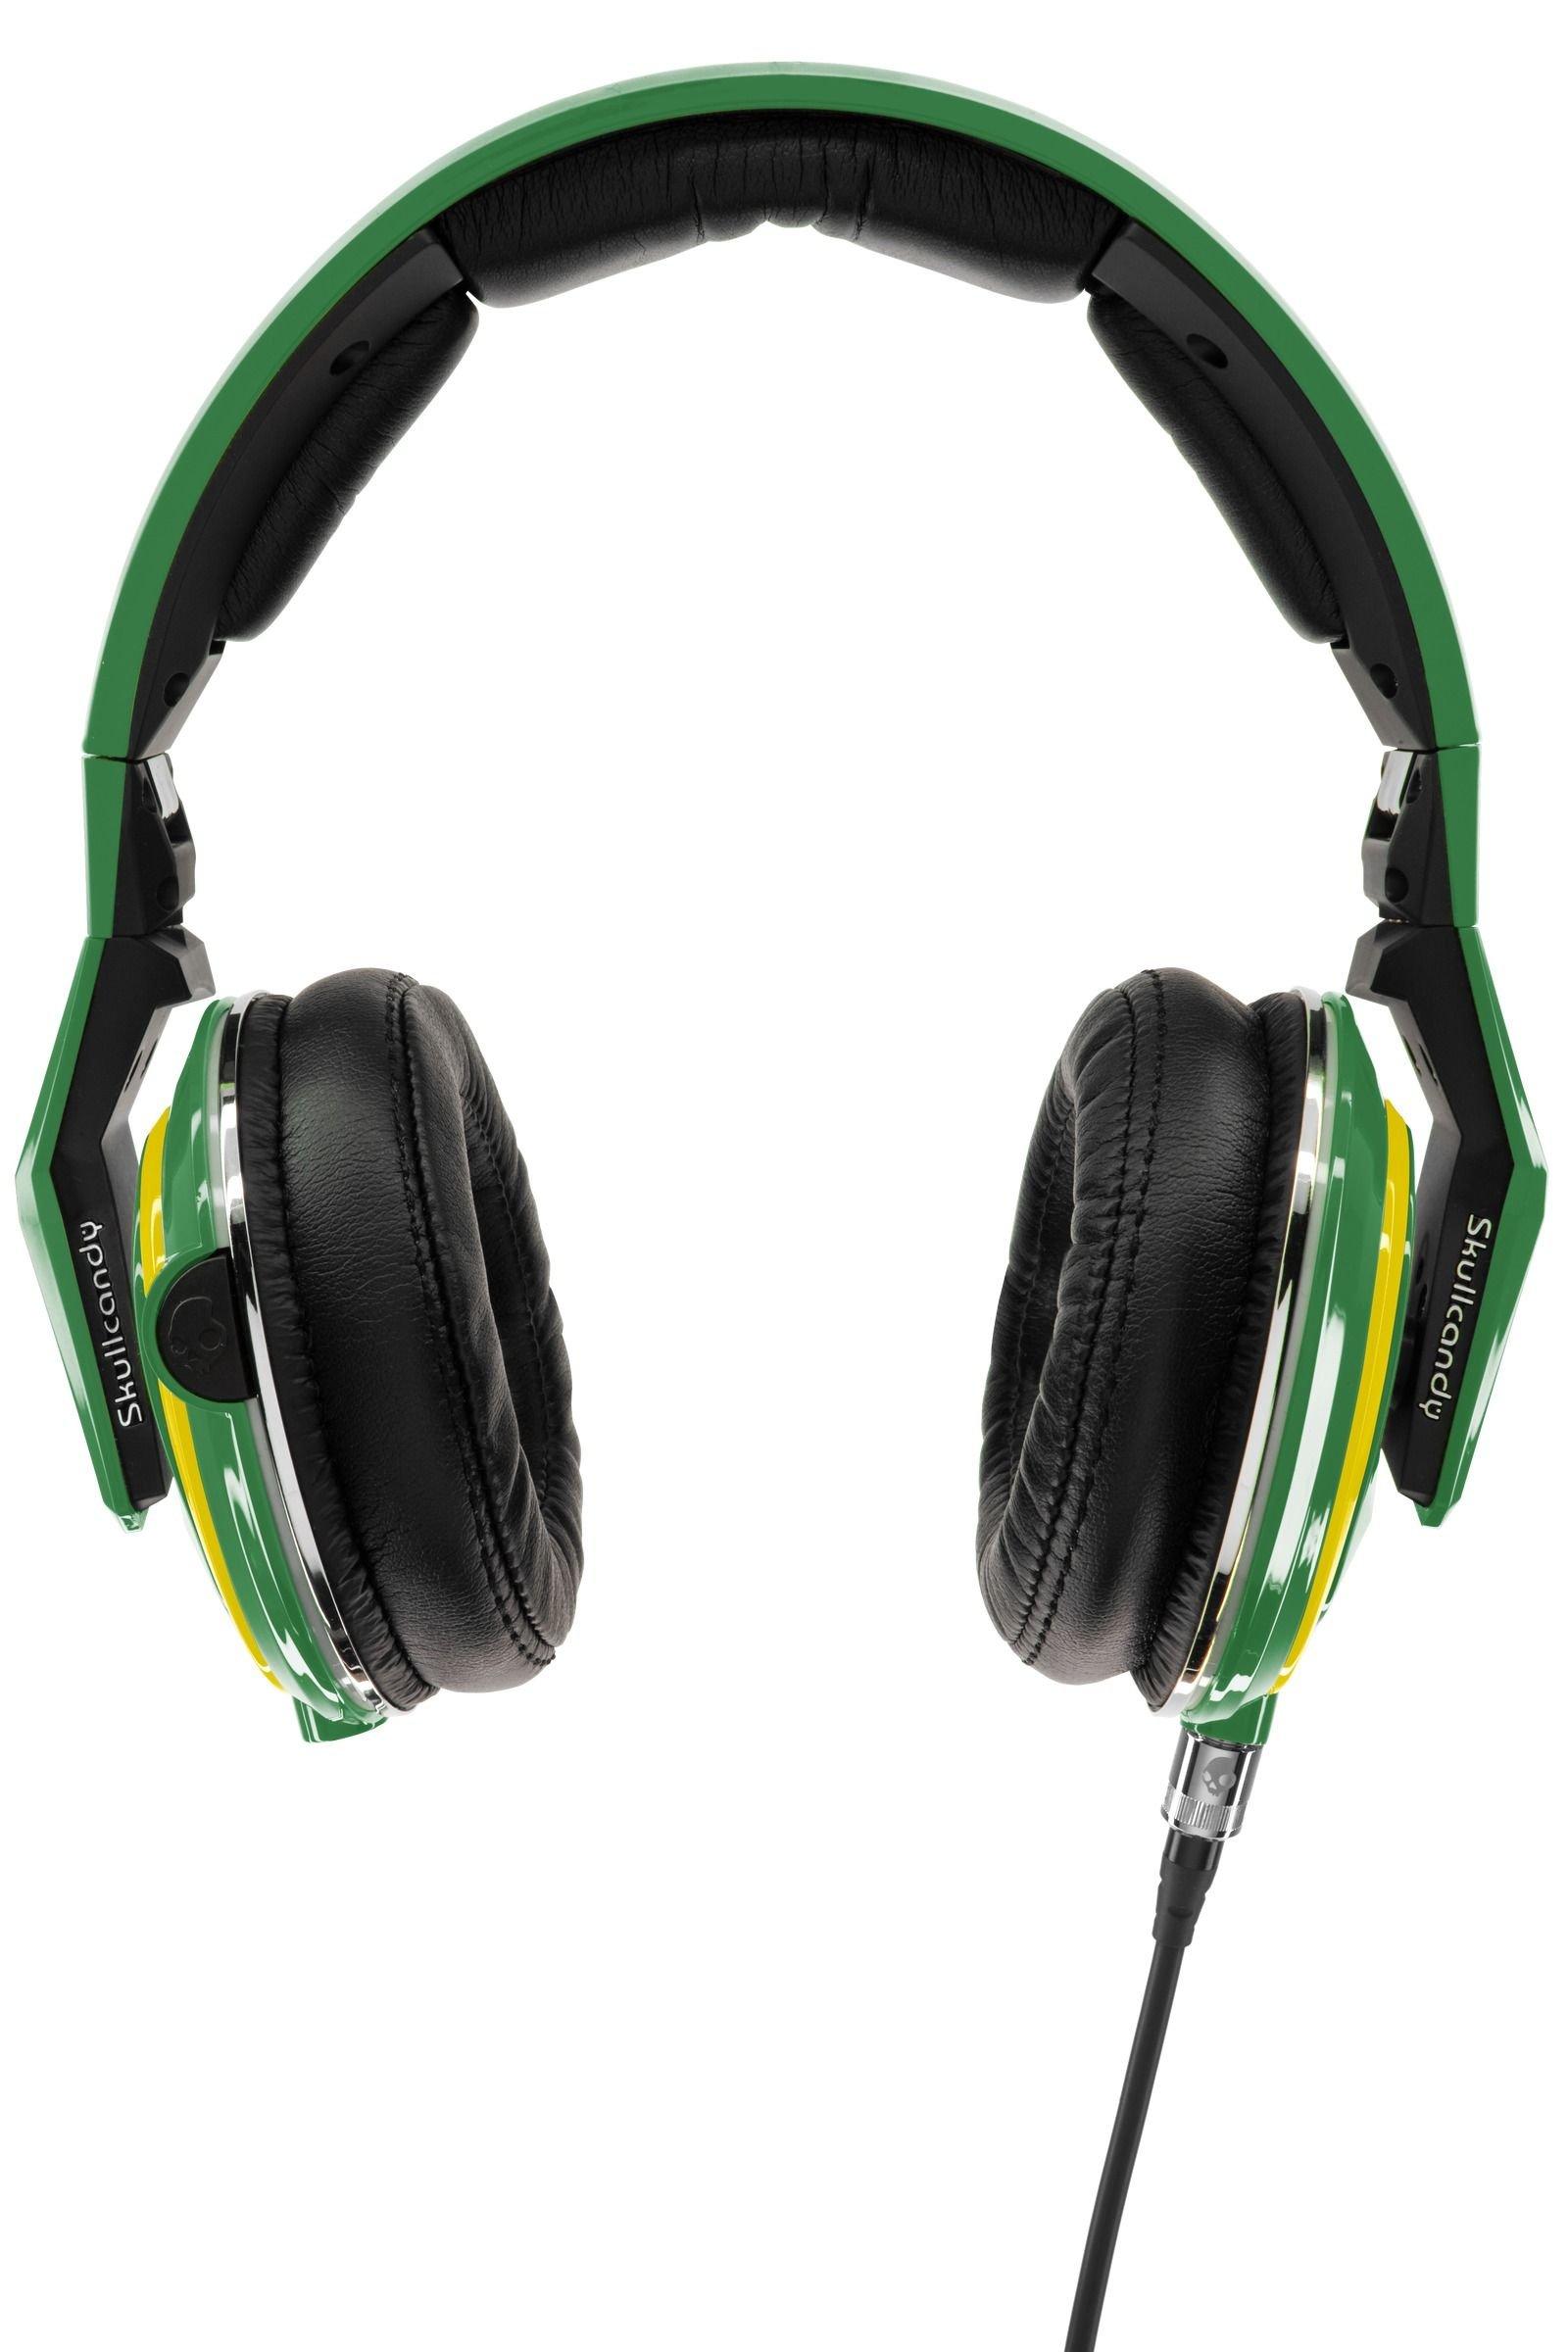 Skullcandy Mix Master Headphones with DJ Capabilities and 3 Button Mic, NBA Boston Celtics by Skullcandy (Image #4)